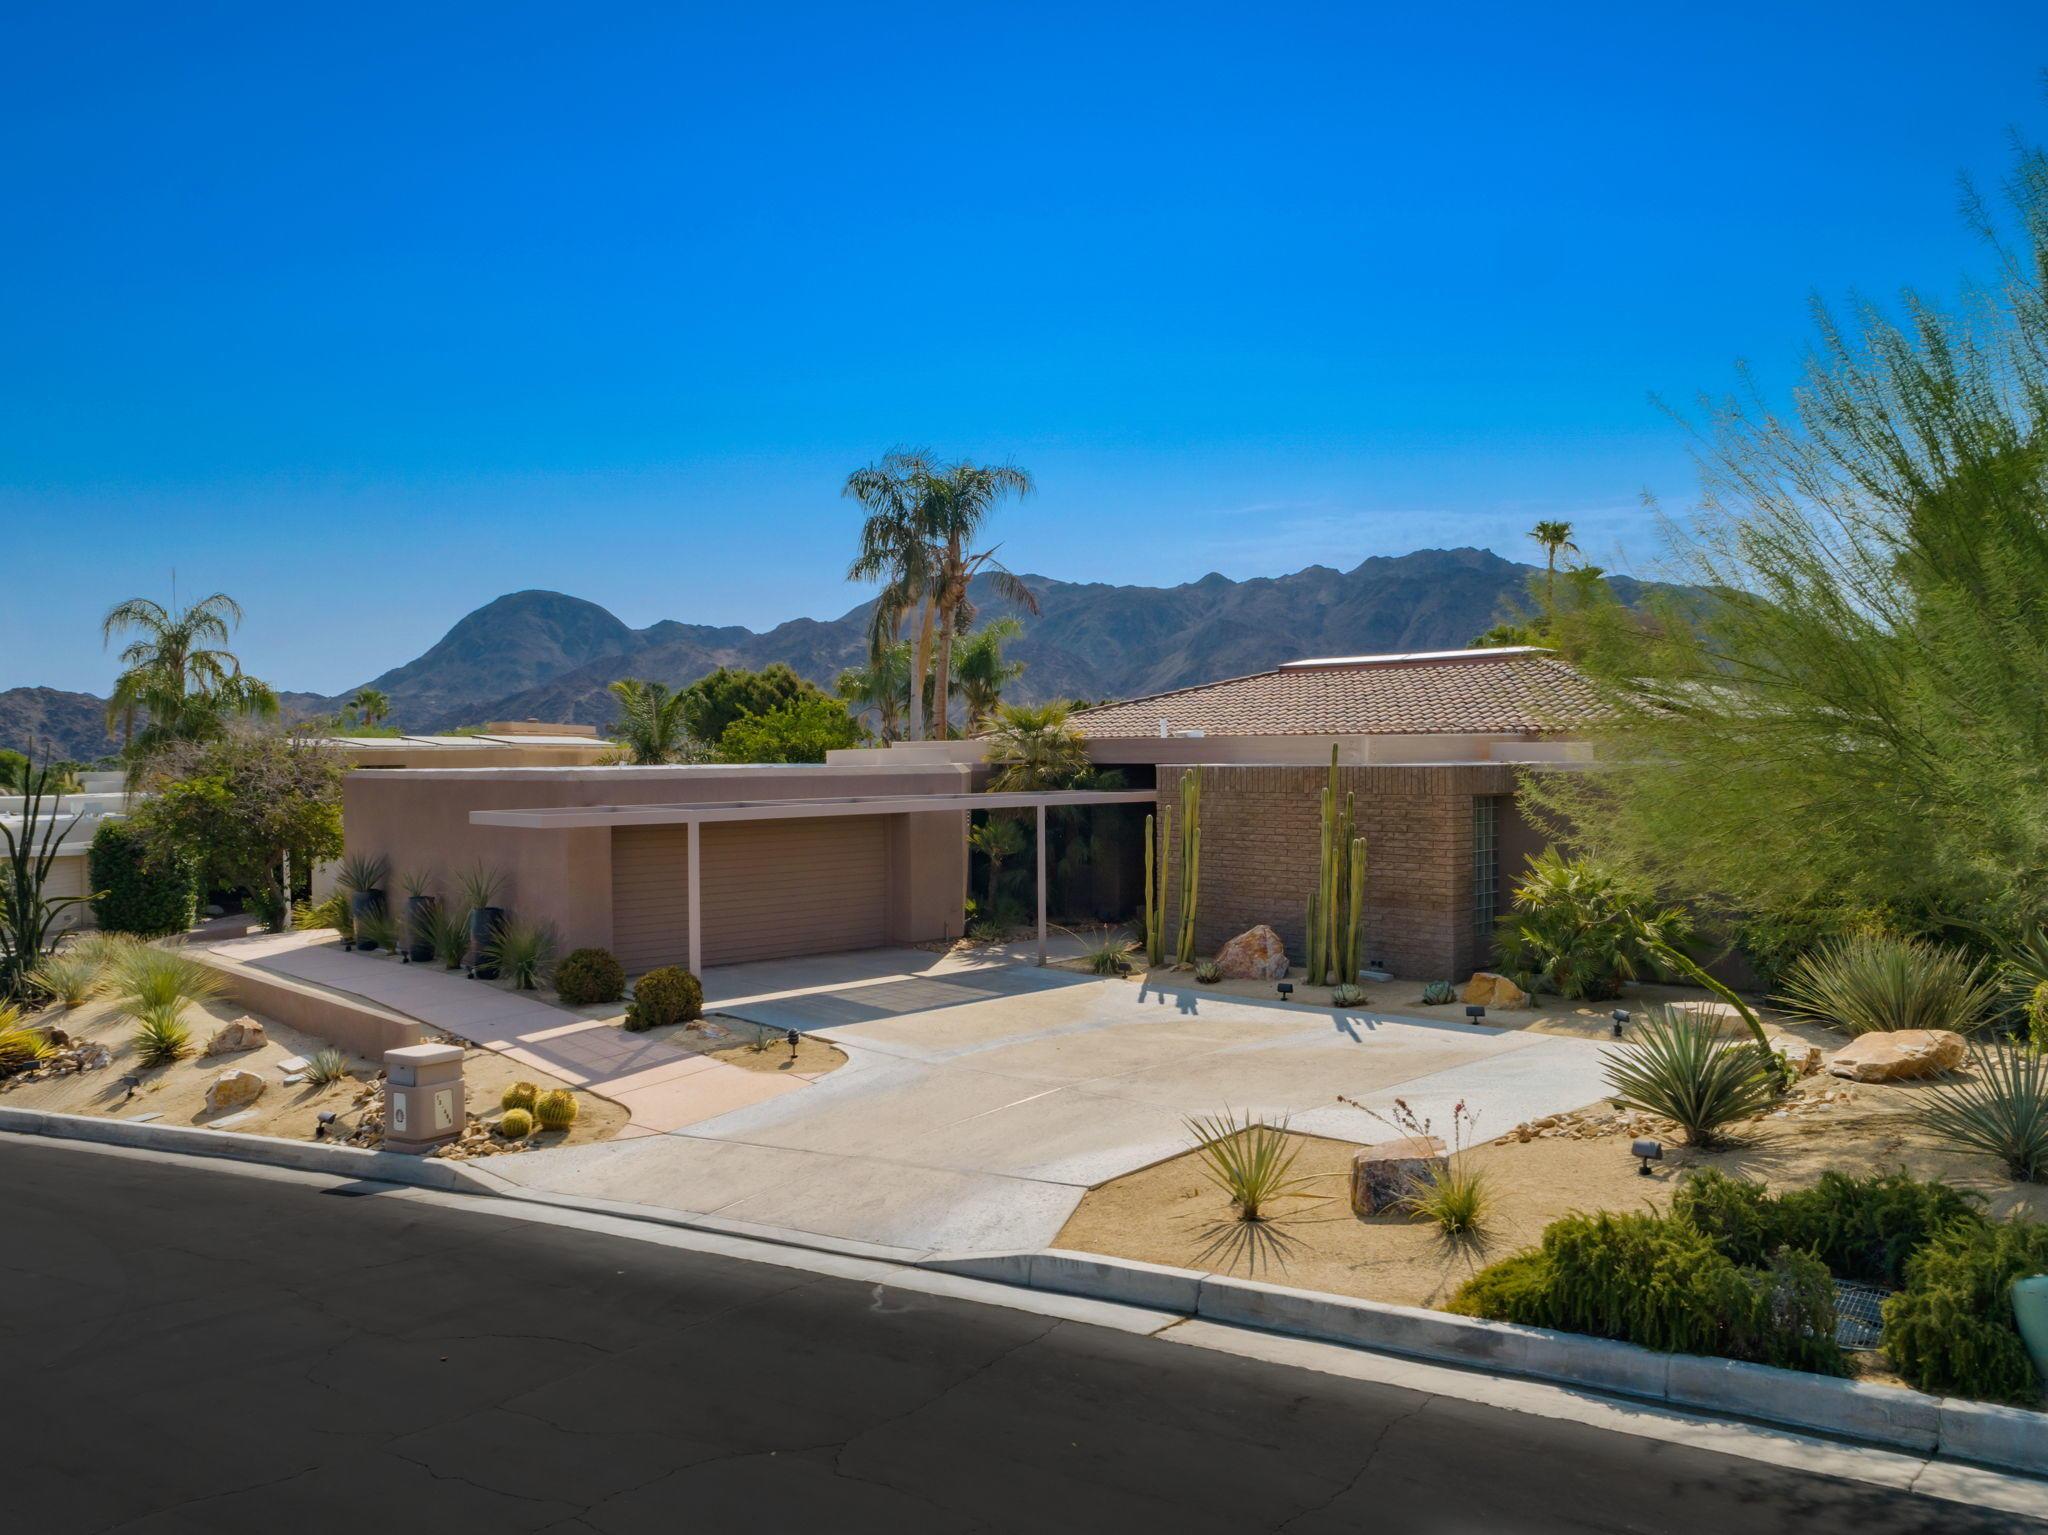 Photo of 73489 Mariposa Drive, Palm Desert, CA 92260